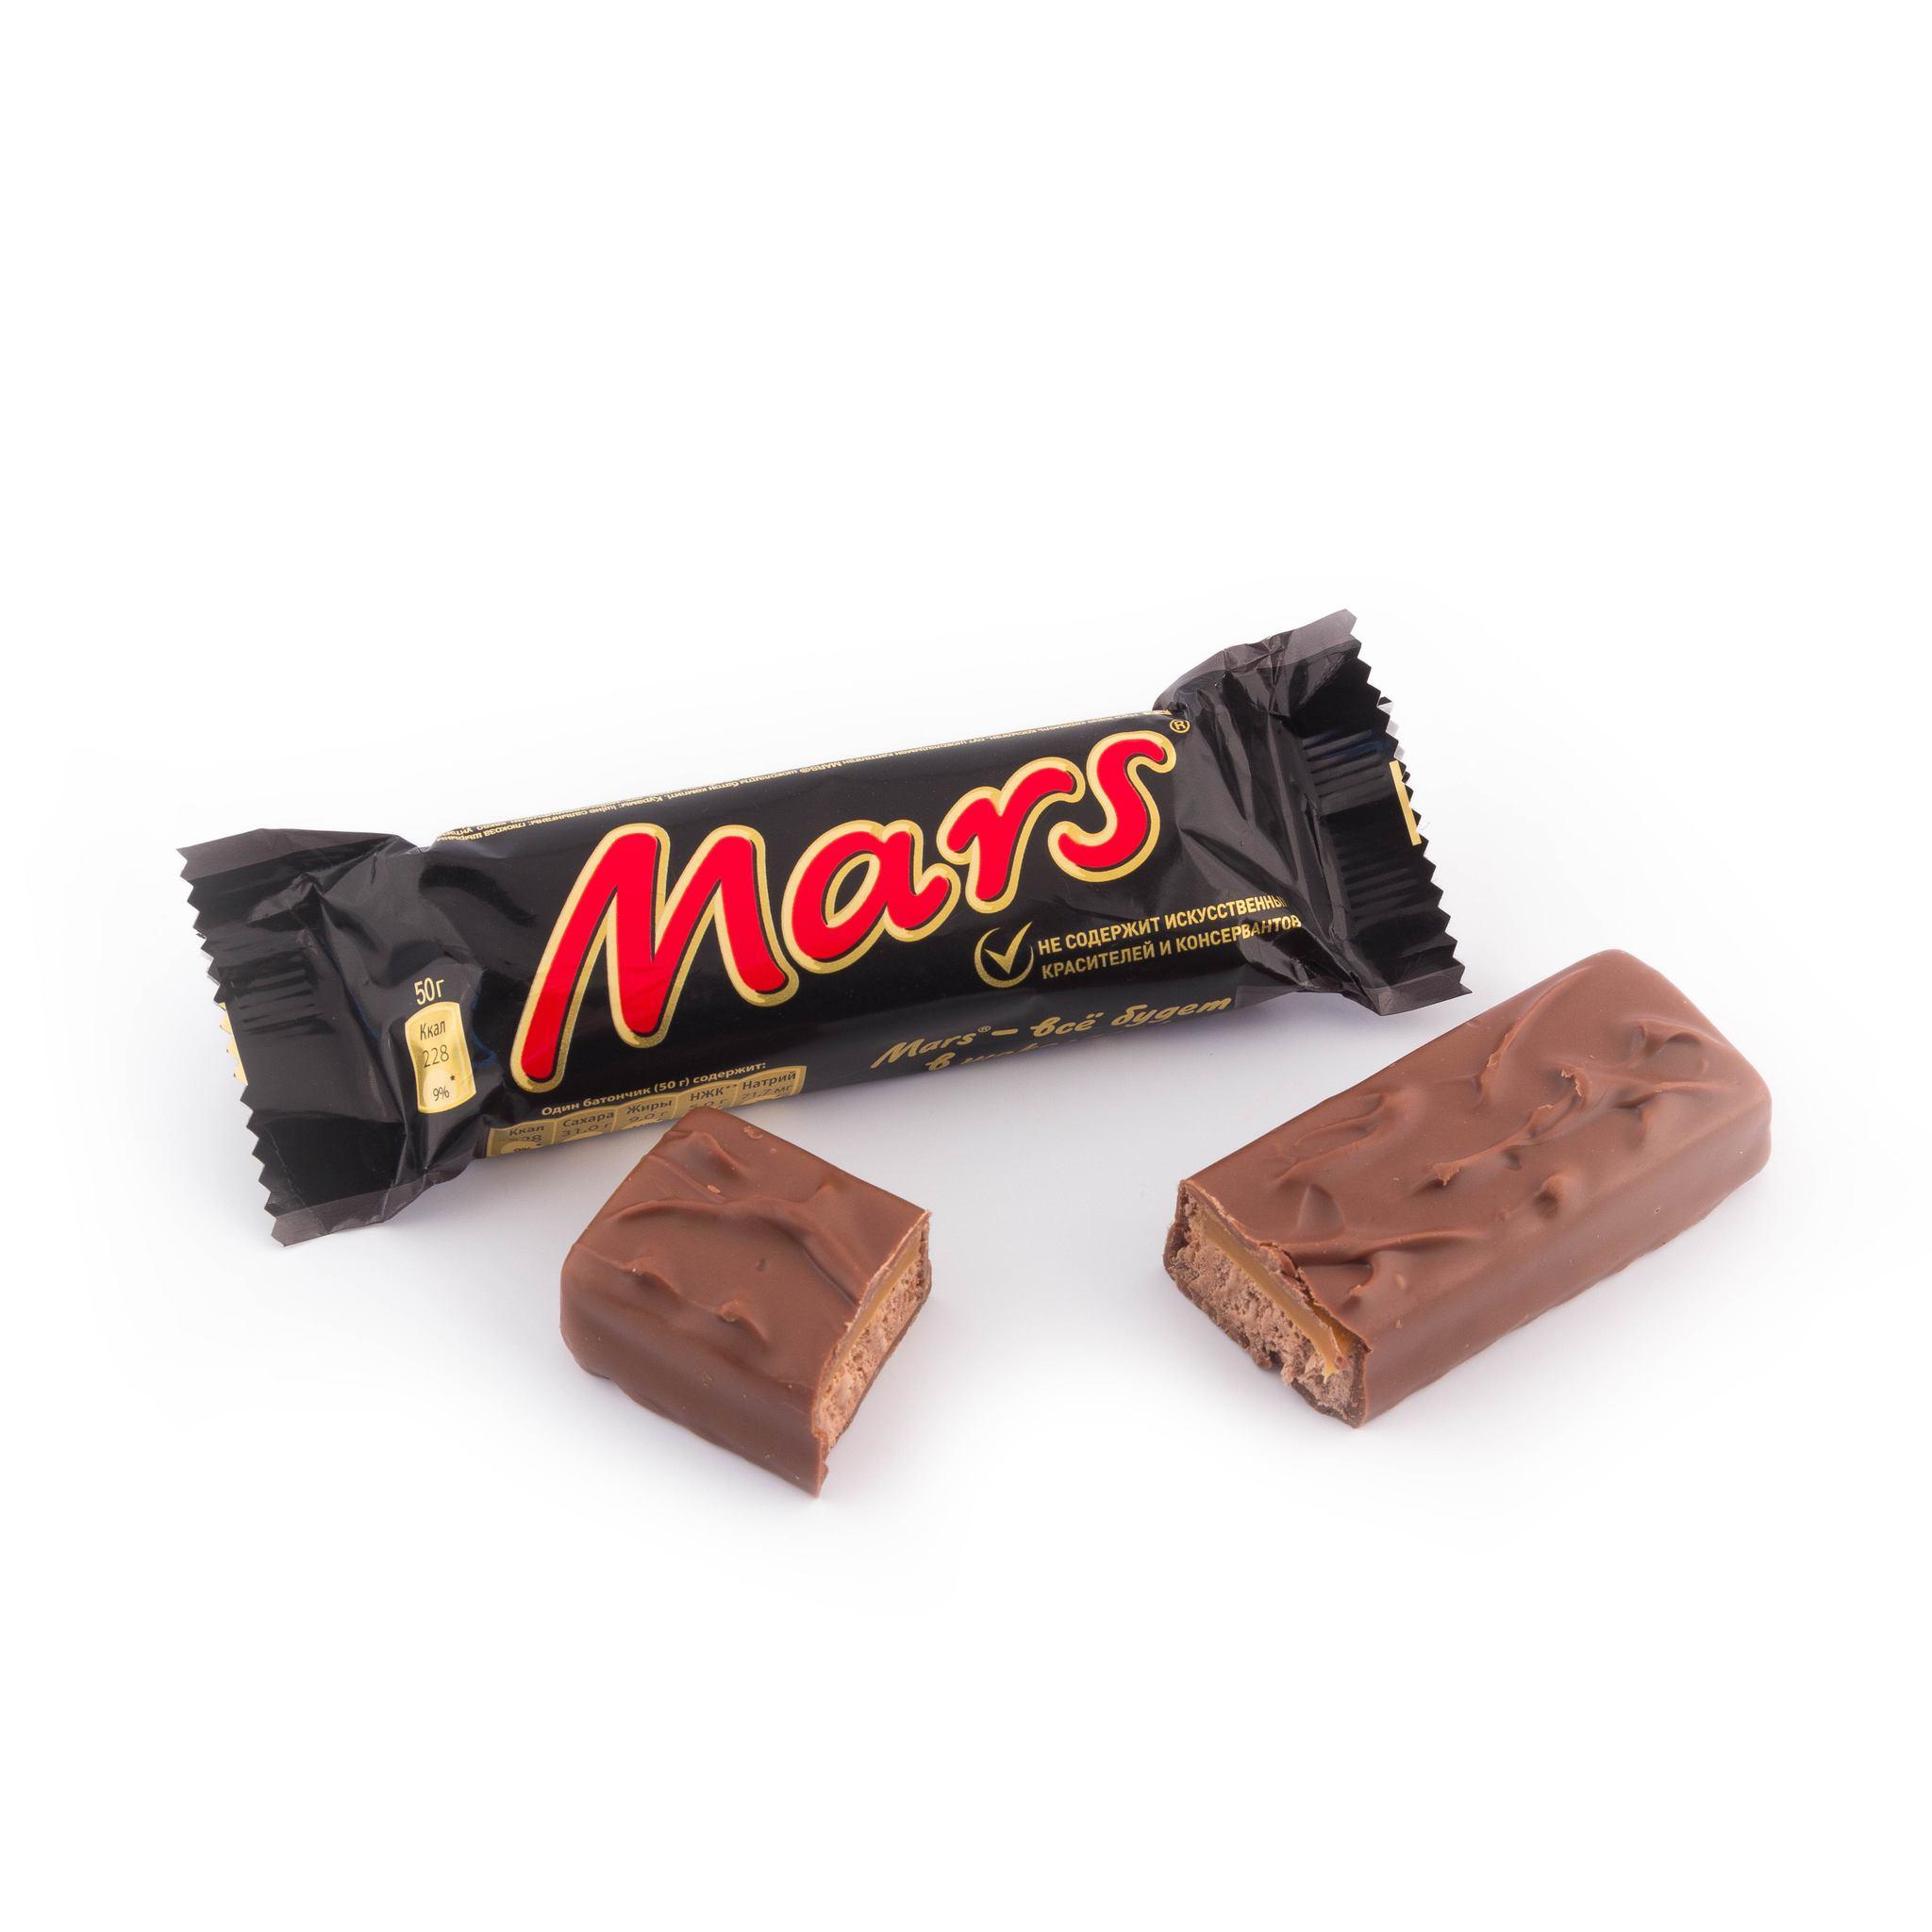 марс шоколад фото